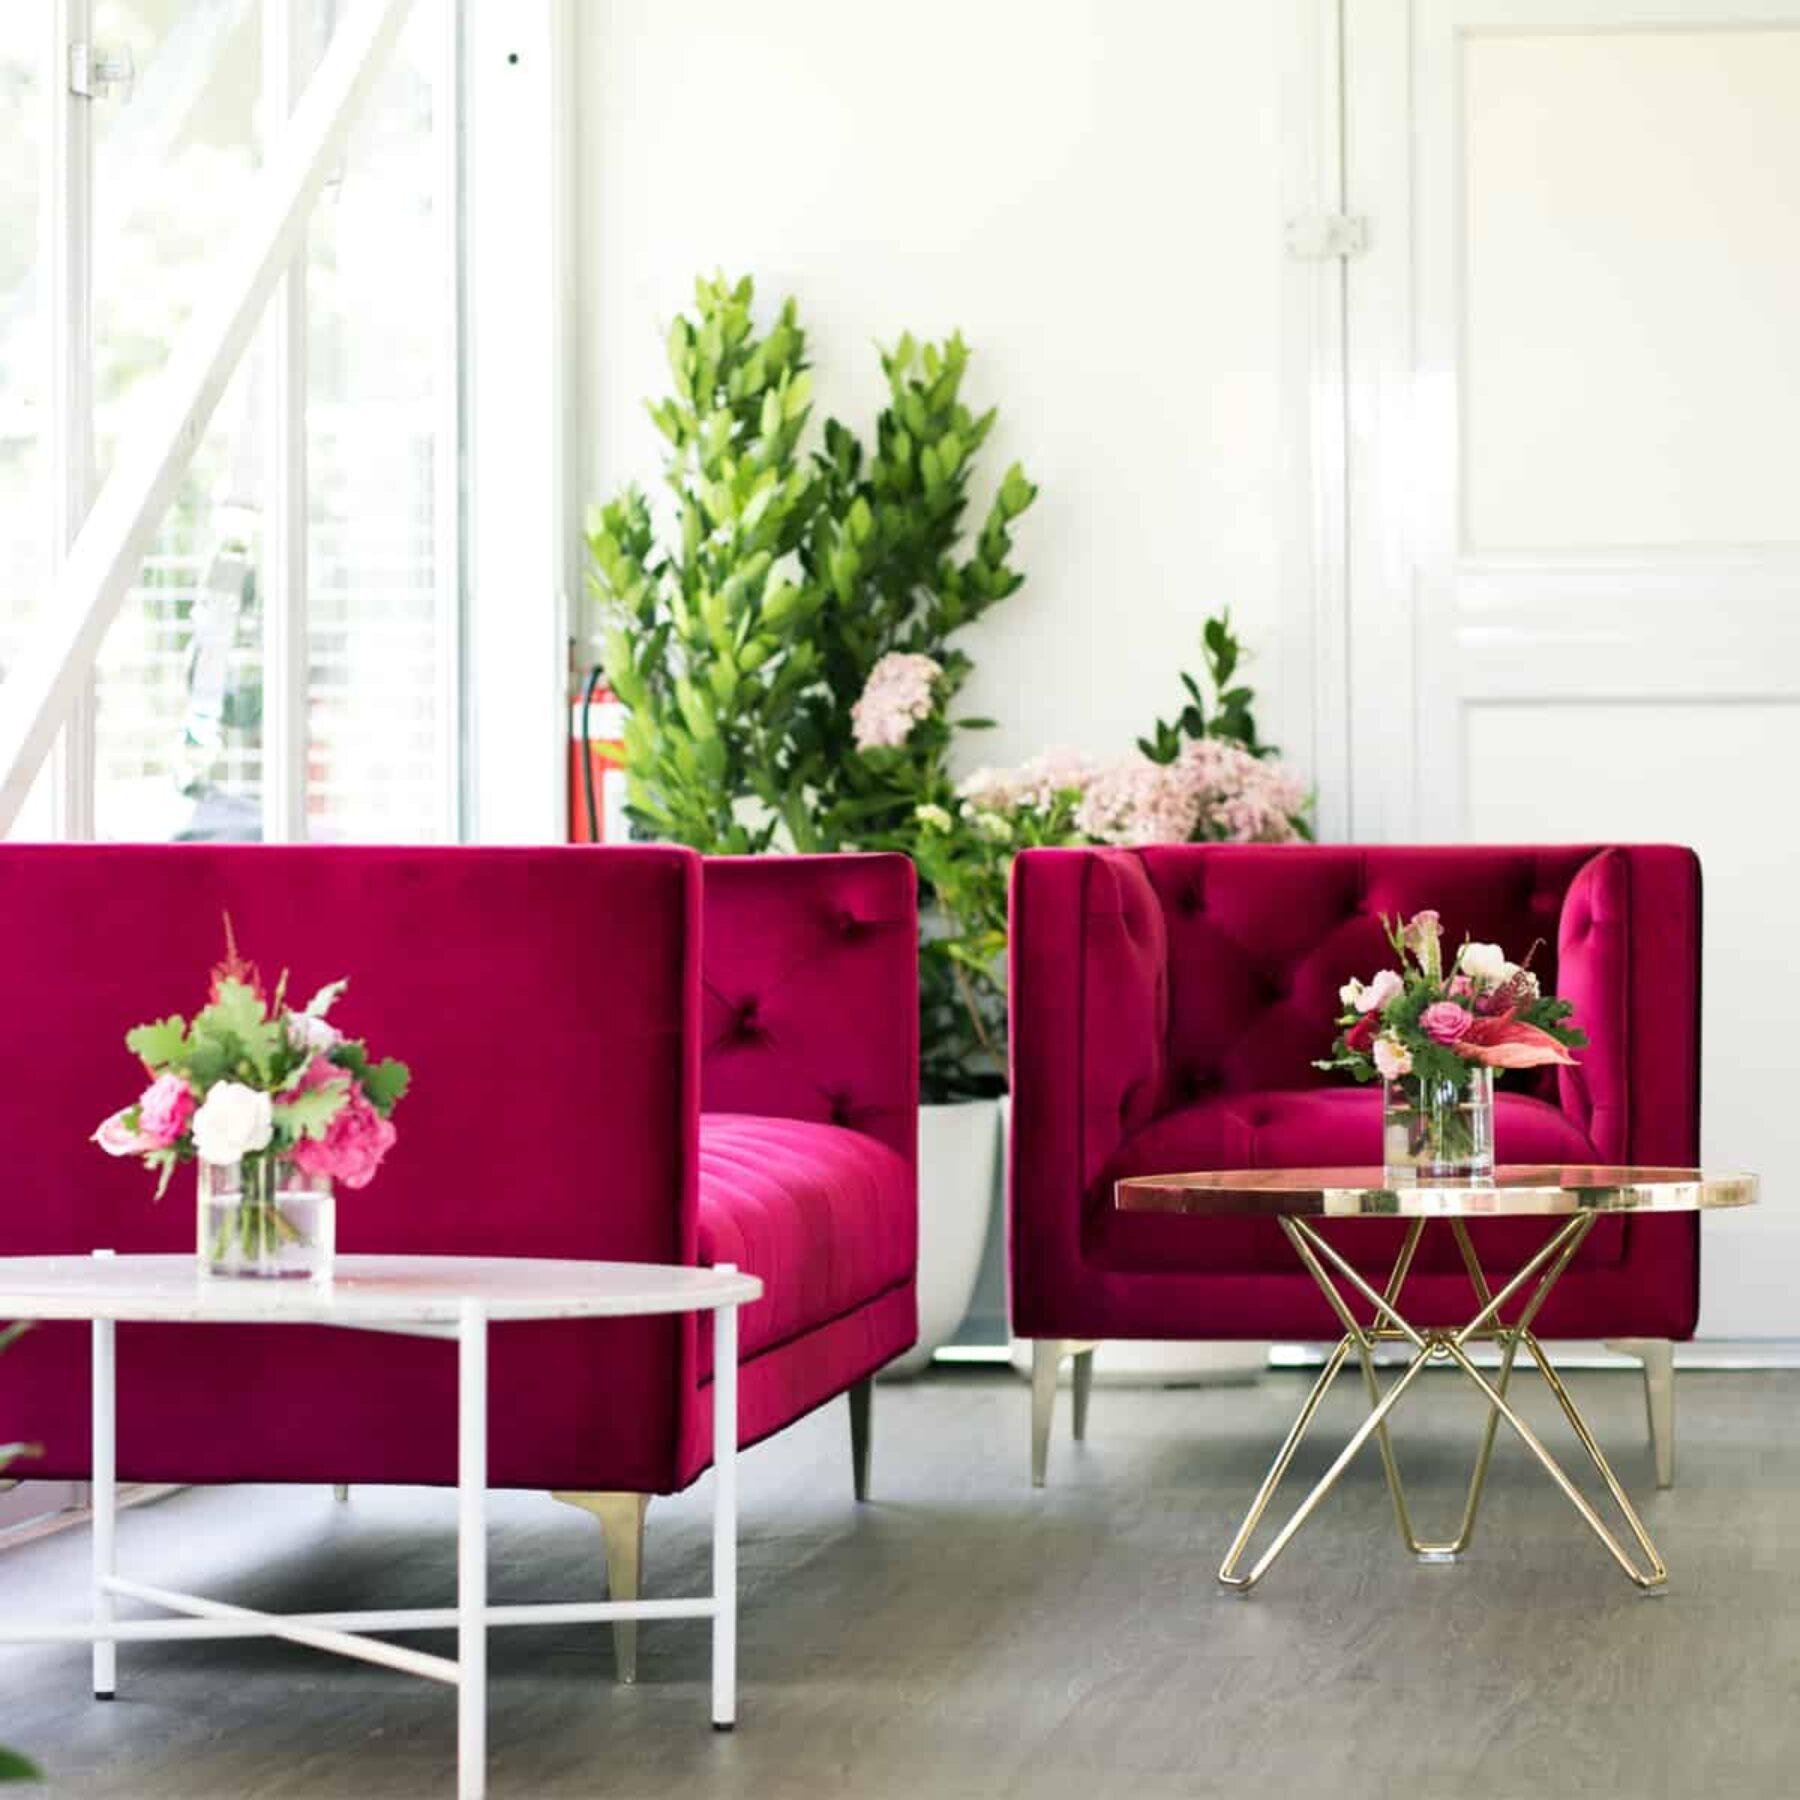 velvet magenta chairs - Dann Event Hire Melbourne